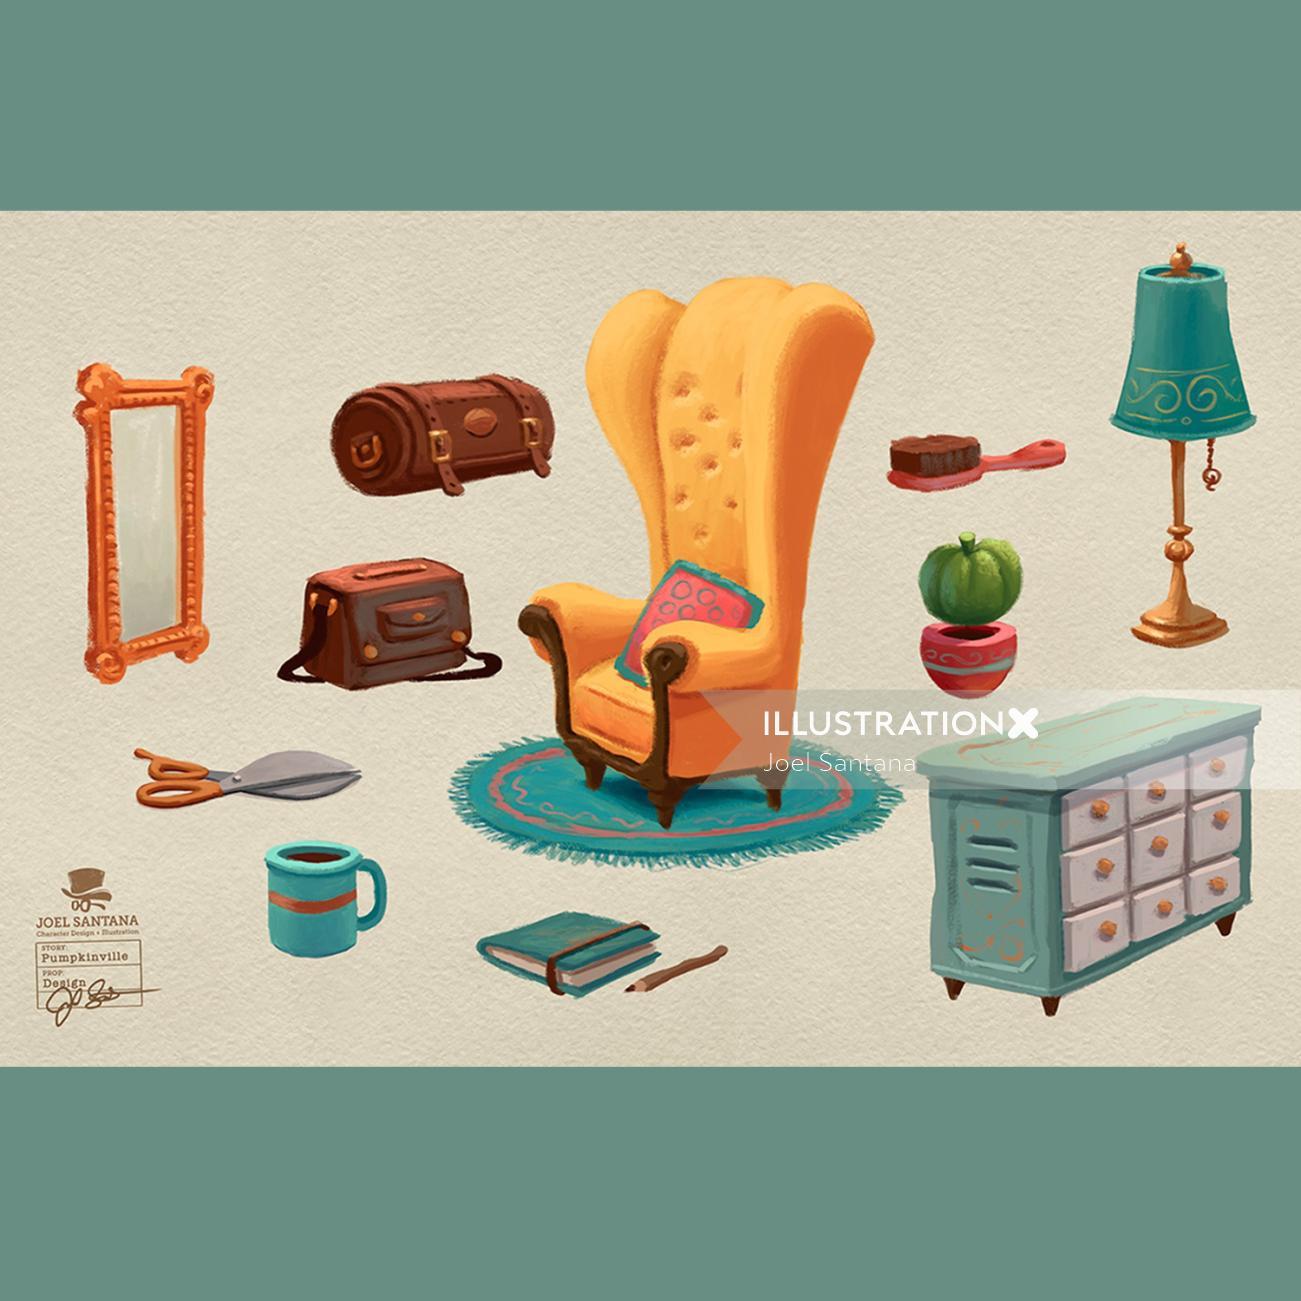 Home needs icons design by Joel Santana